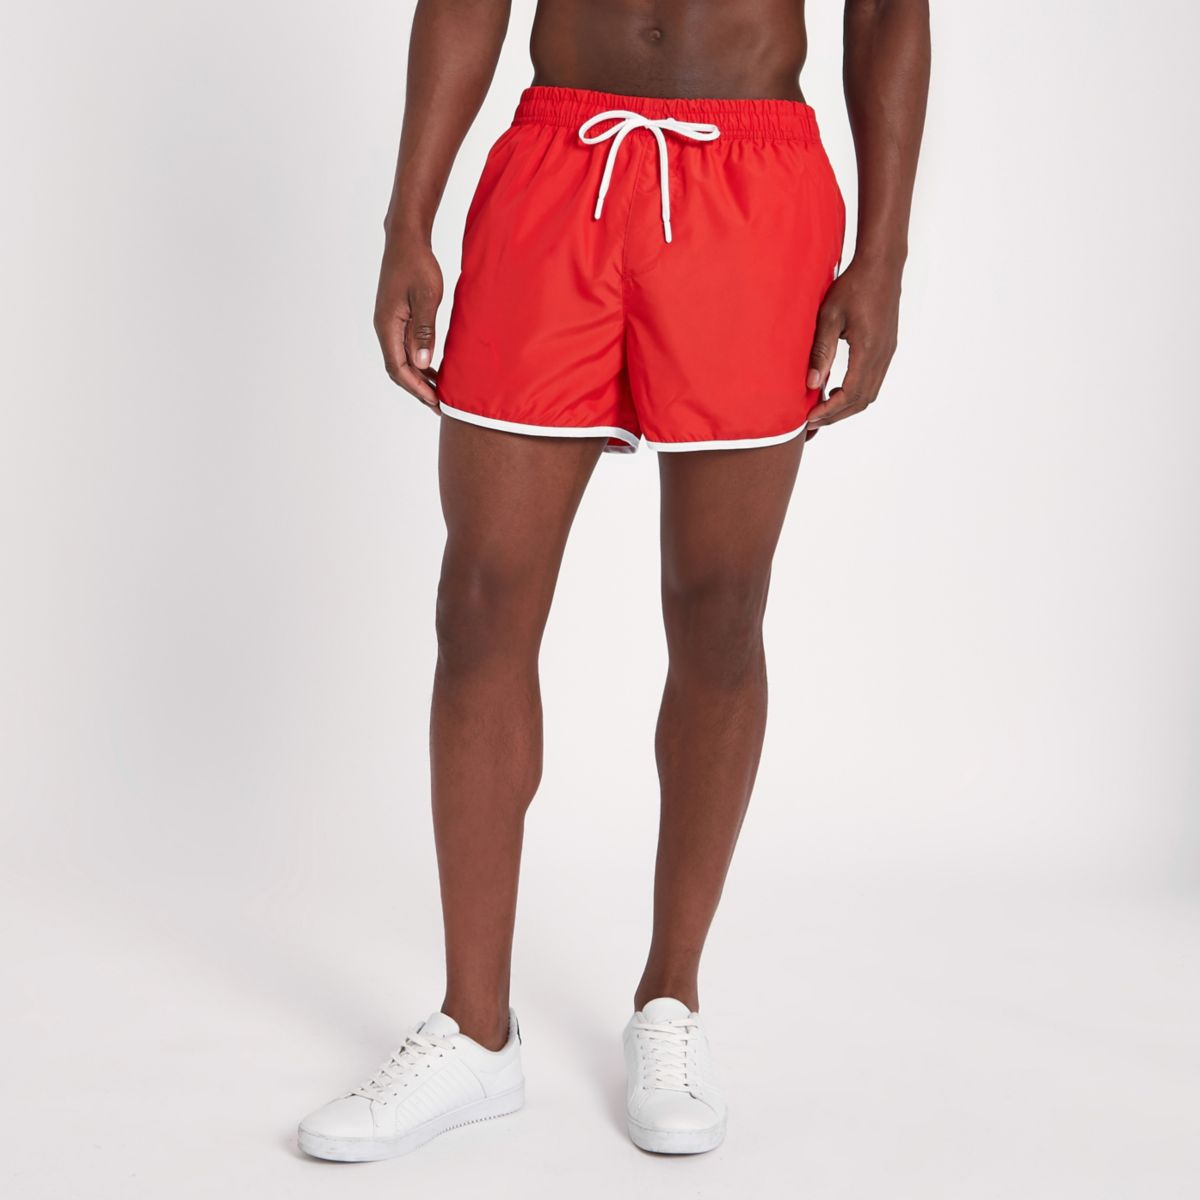 Red stripe side short swim shorts